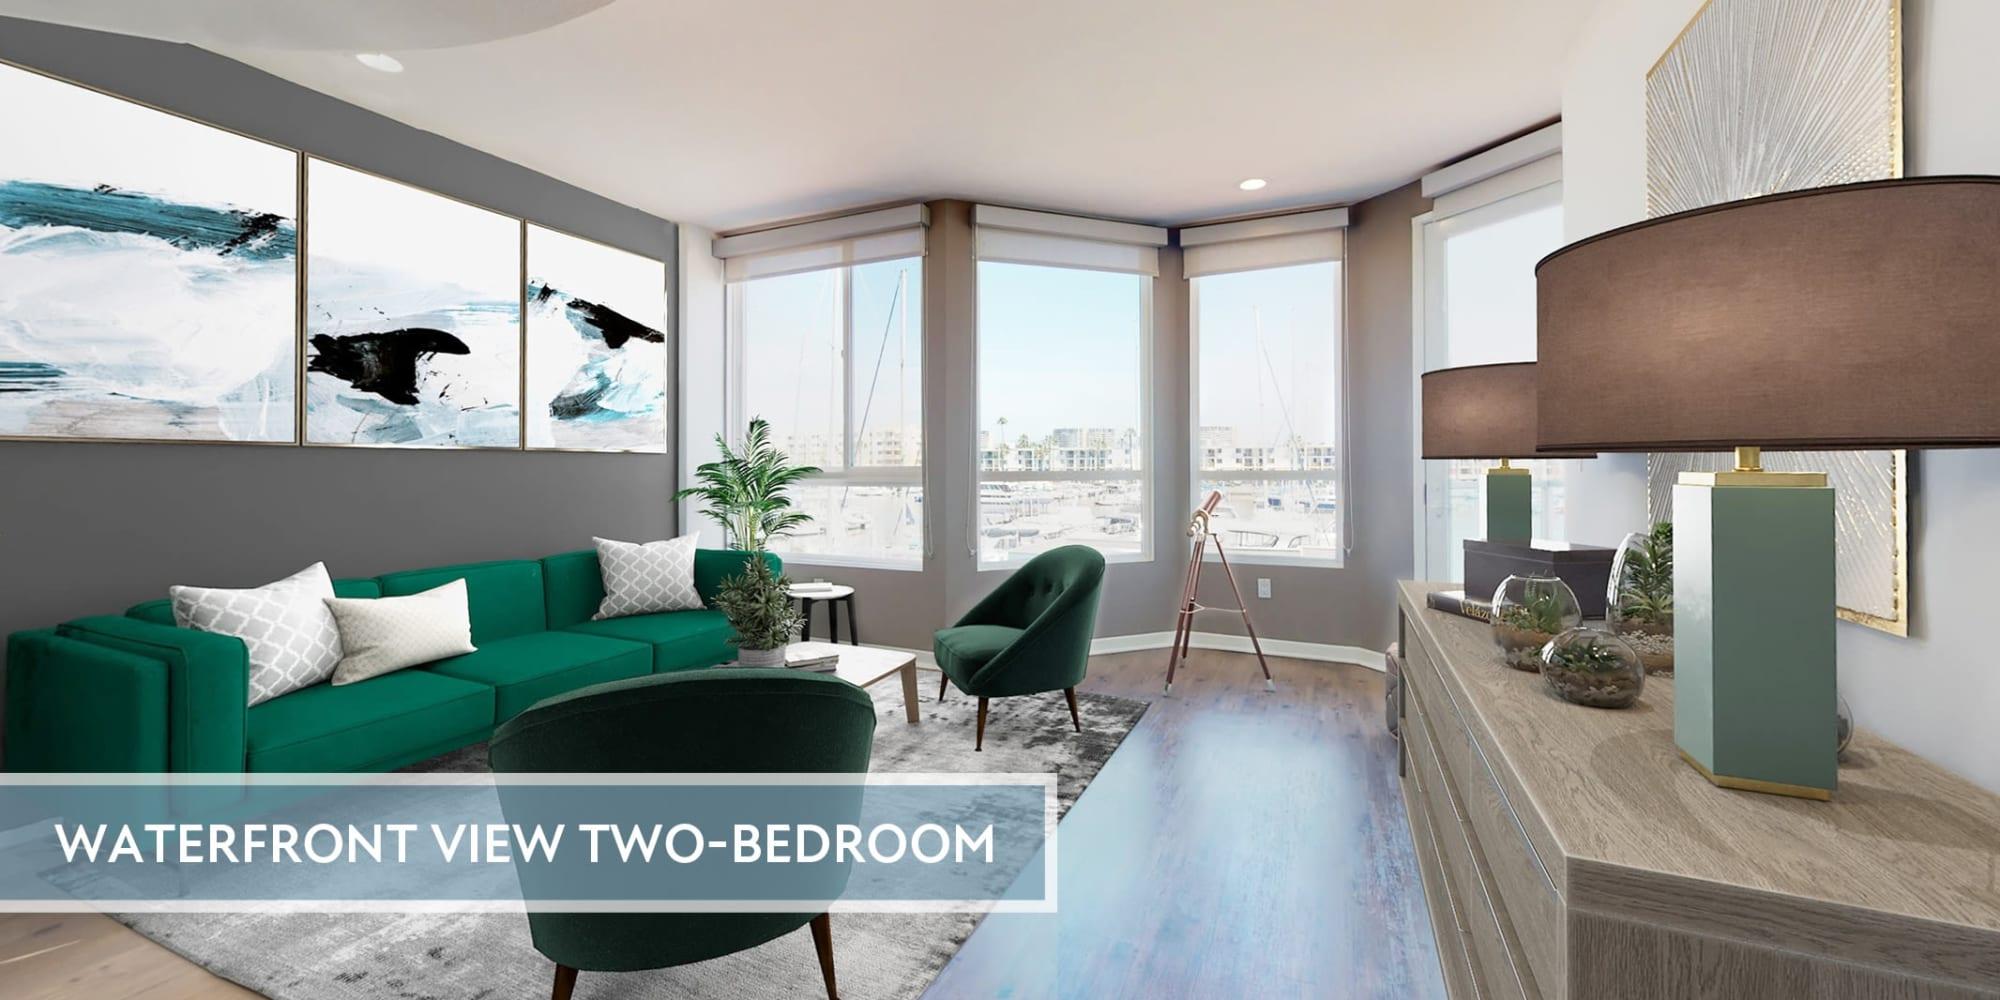 Spacious  apartment's living room with views of the marina and hardwood floors at Esprit Marina del Rey in Marina del Rey, California